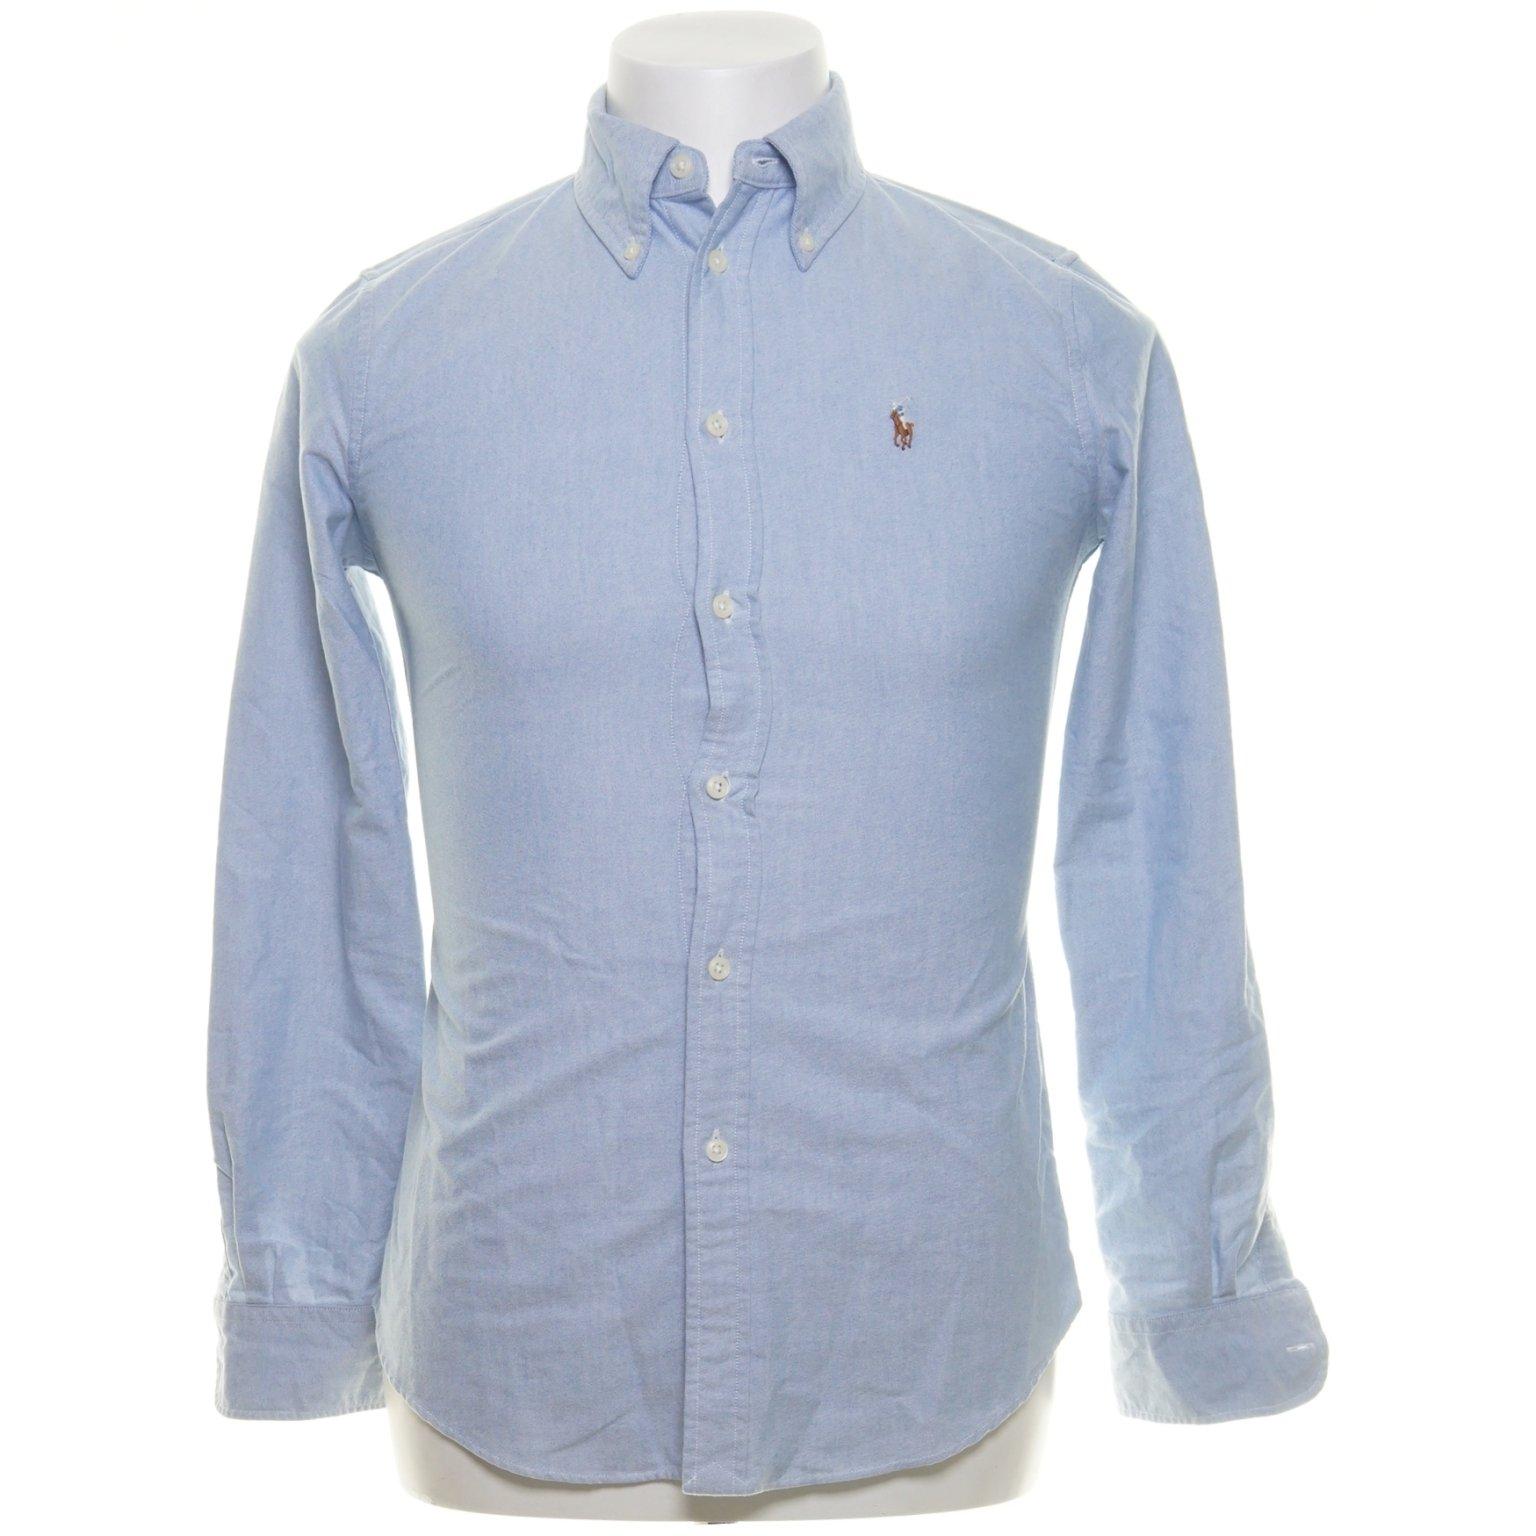 Ralph Lauren Active Black Long Sleeve Tee Shirt Crewneck LRL NWT